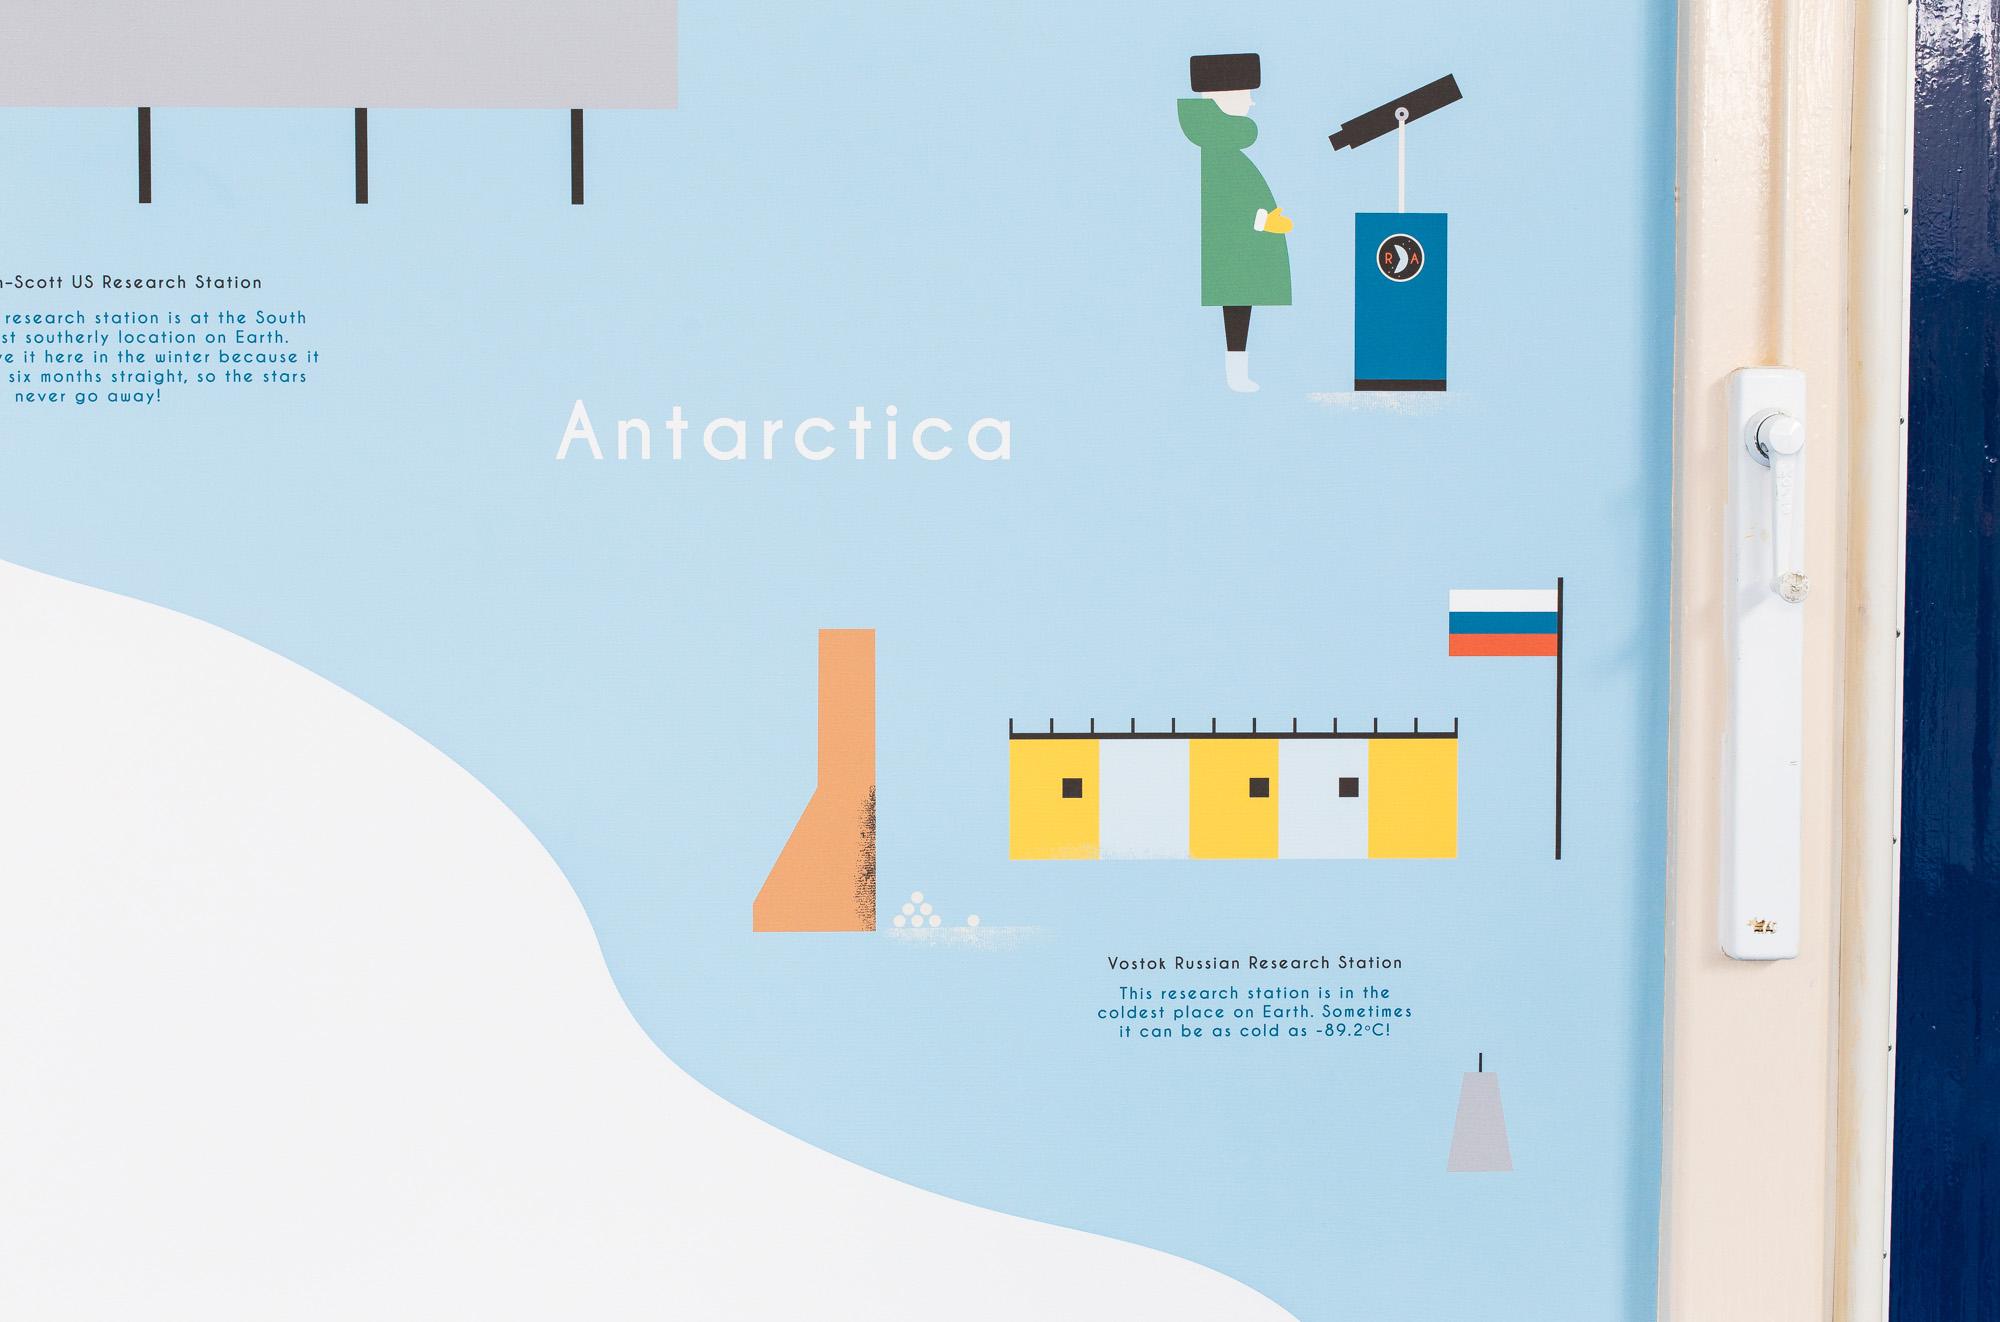 hannahalice-illustration-spacedesign-world-map-grazebrookprimaryschool-mural-antarctica-wallpaper.jpg